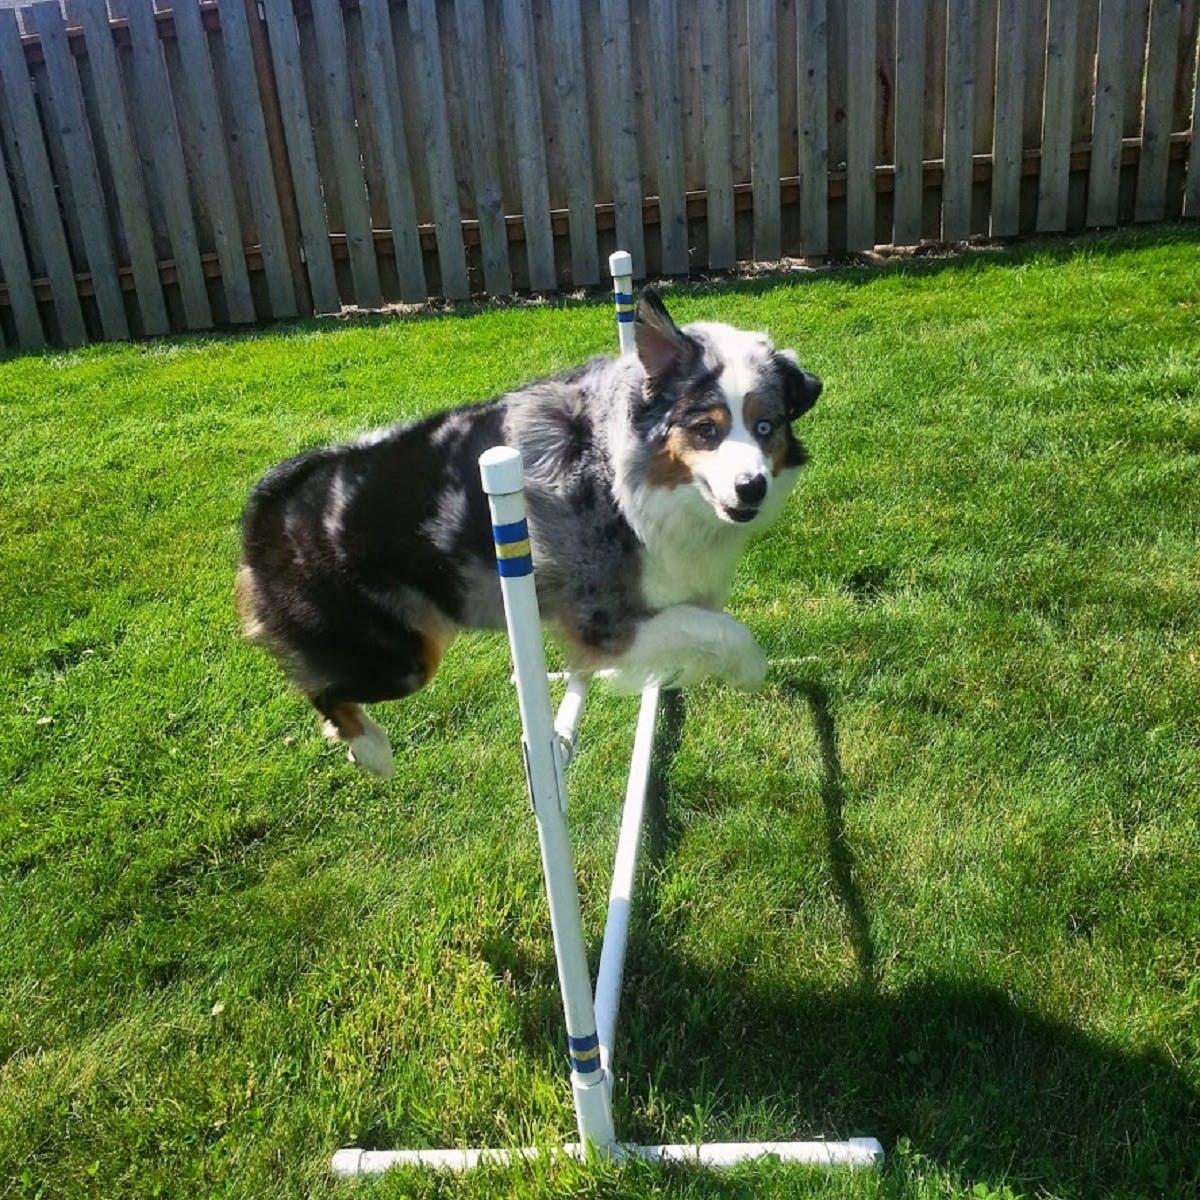 Sparrow the dog jumps in a dog agility course